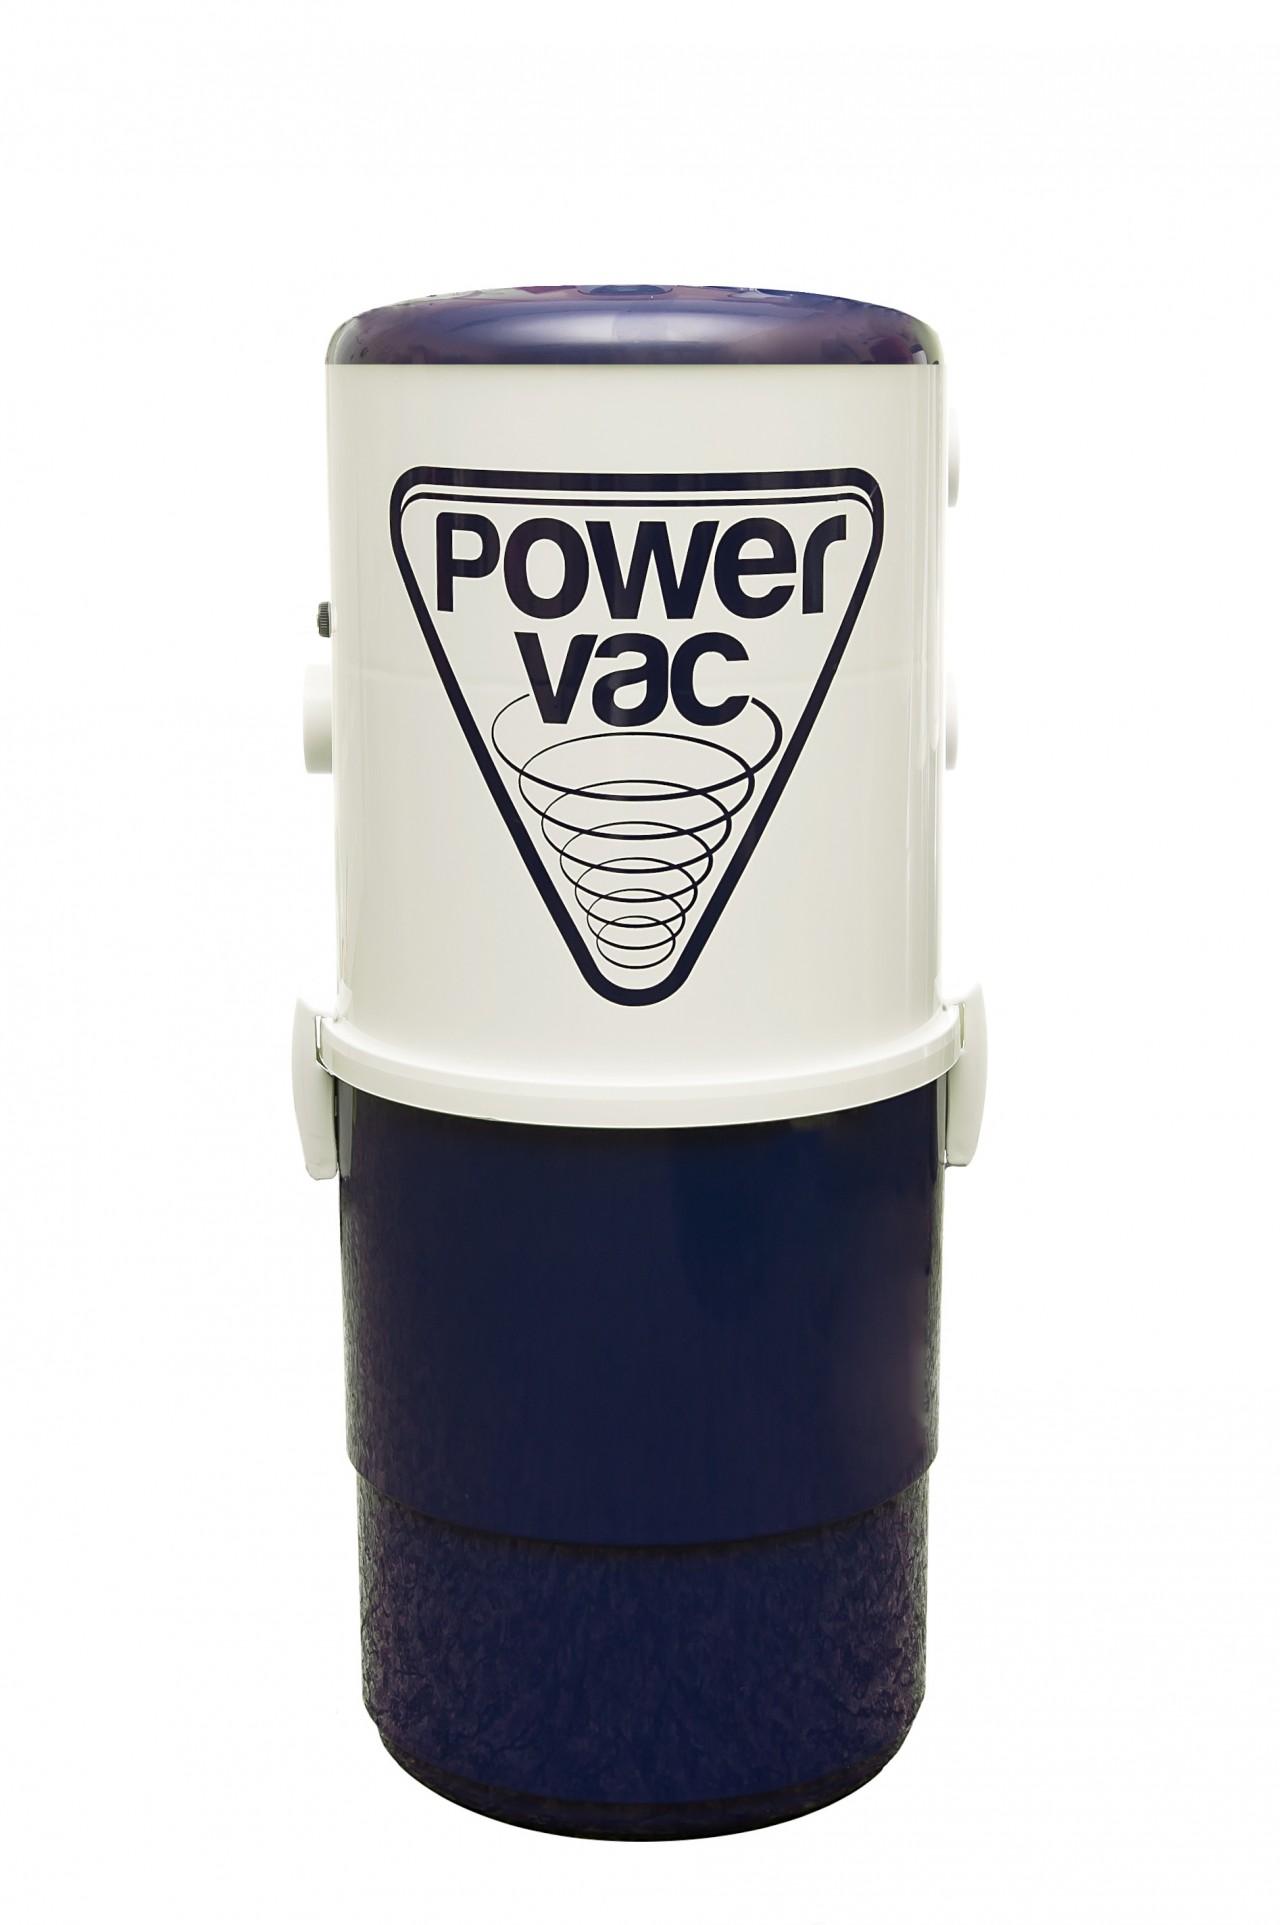 Jednostka centralna POWER VAC 1.6